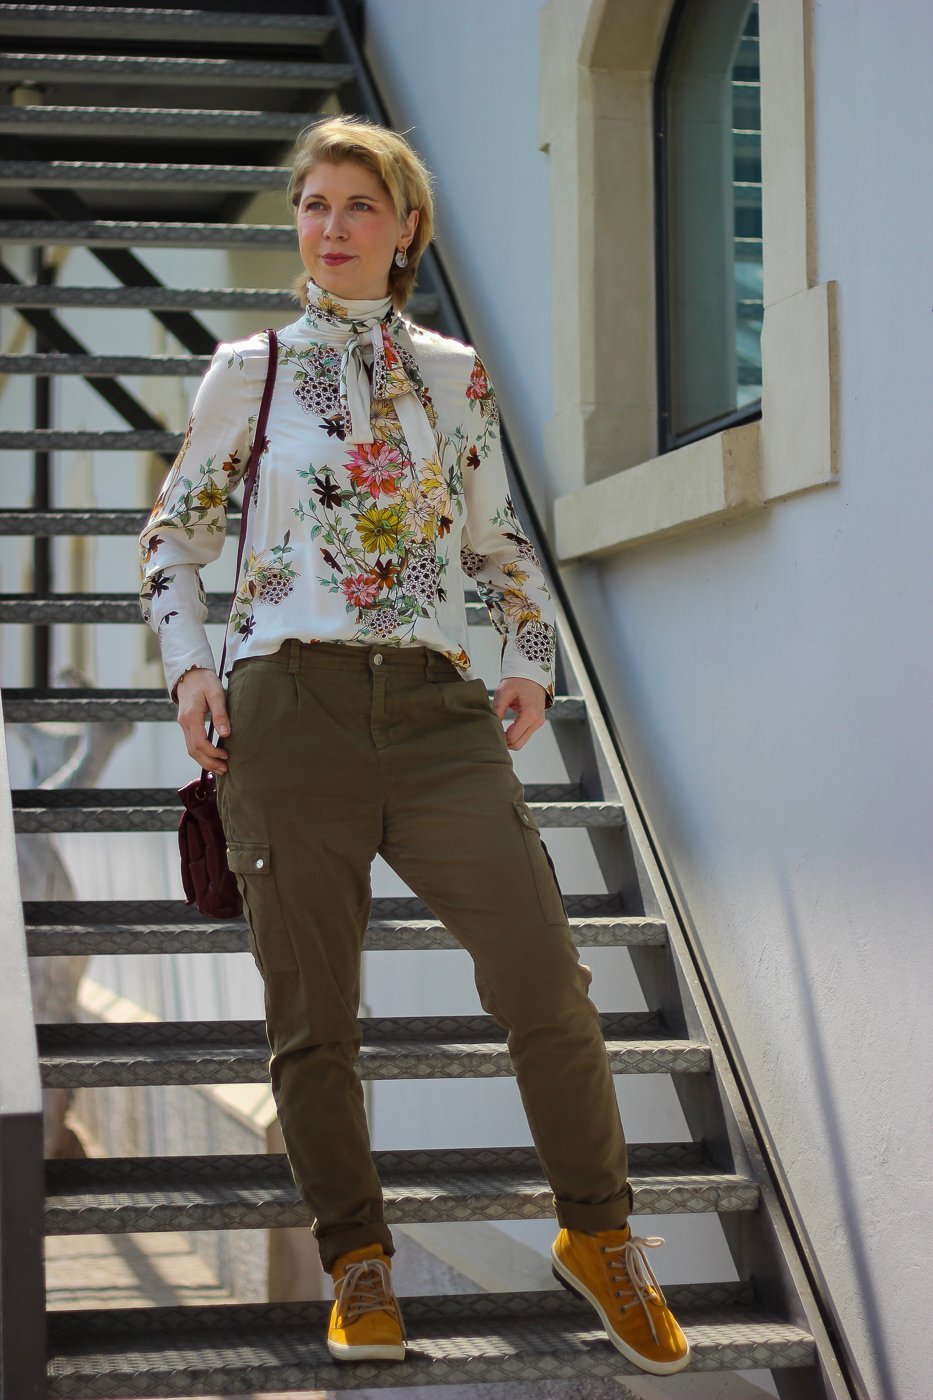 conny doll lifestyle: Schluppenbluse, und khakifarbene Hose, ein Frühlingslook mit Blumenprint